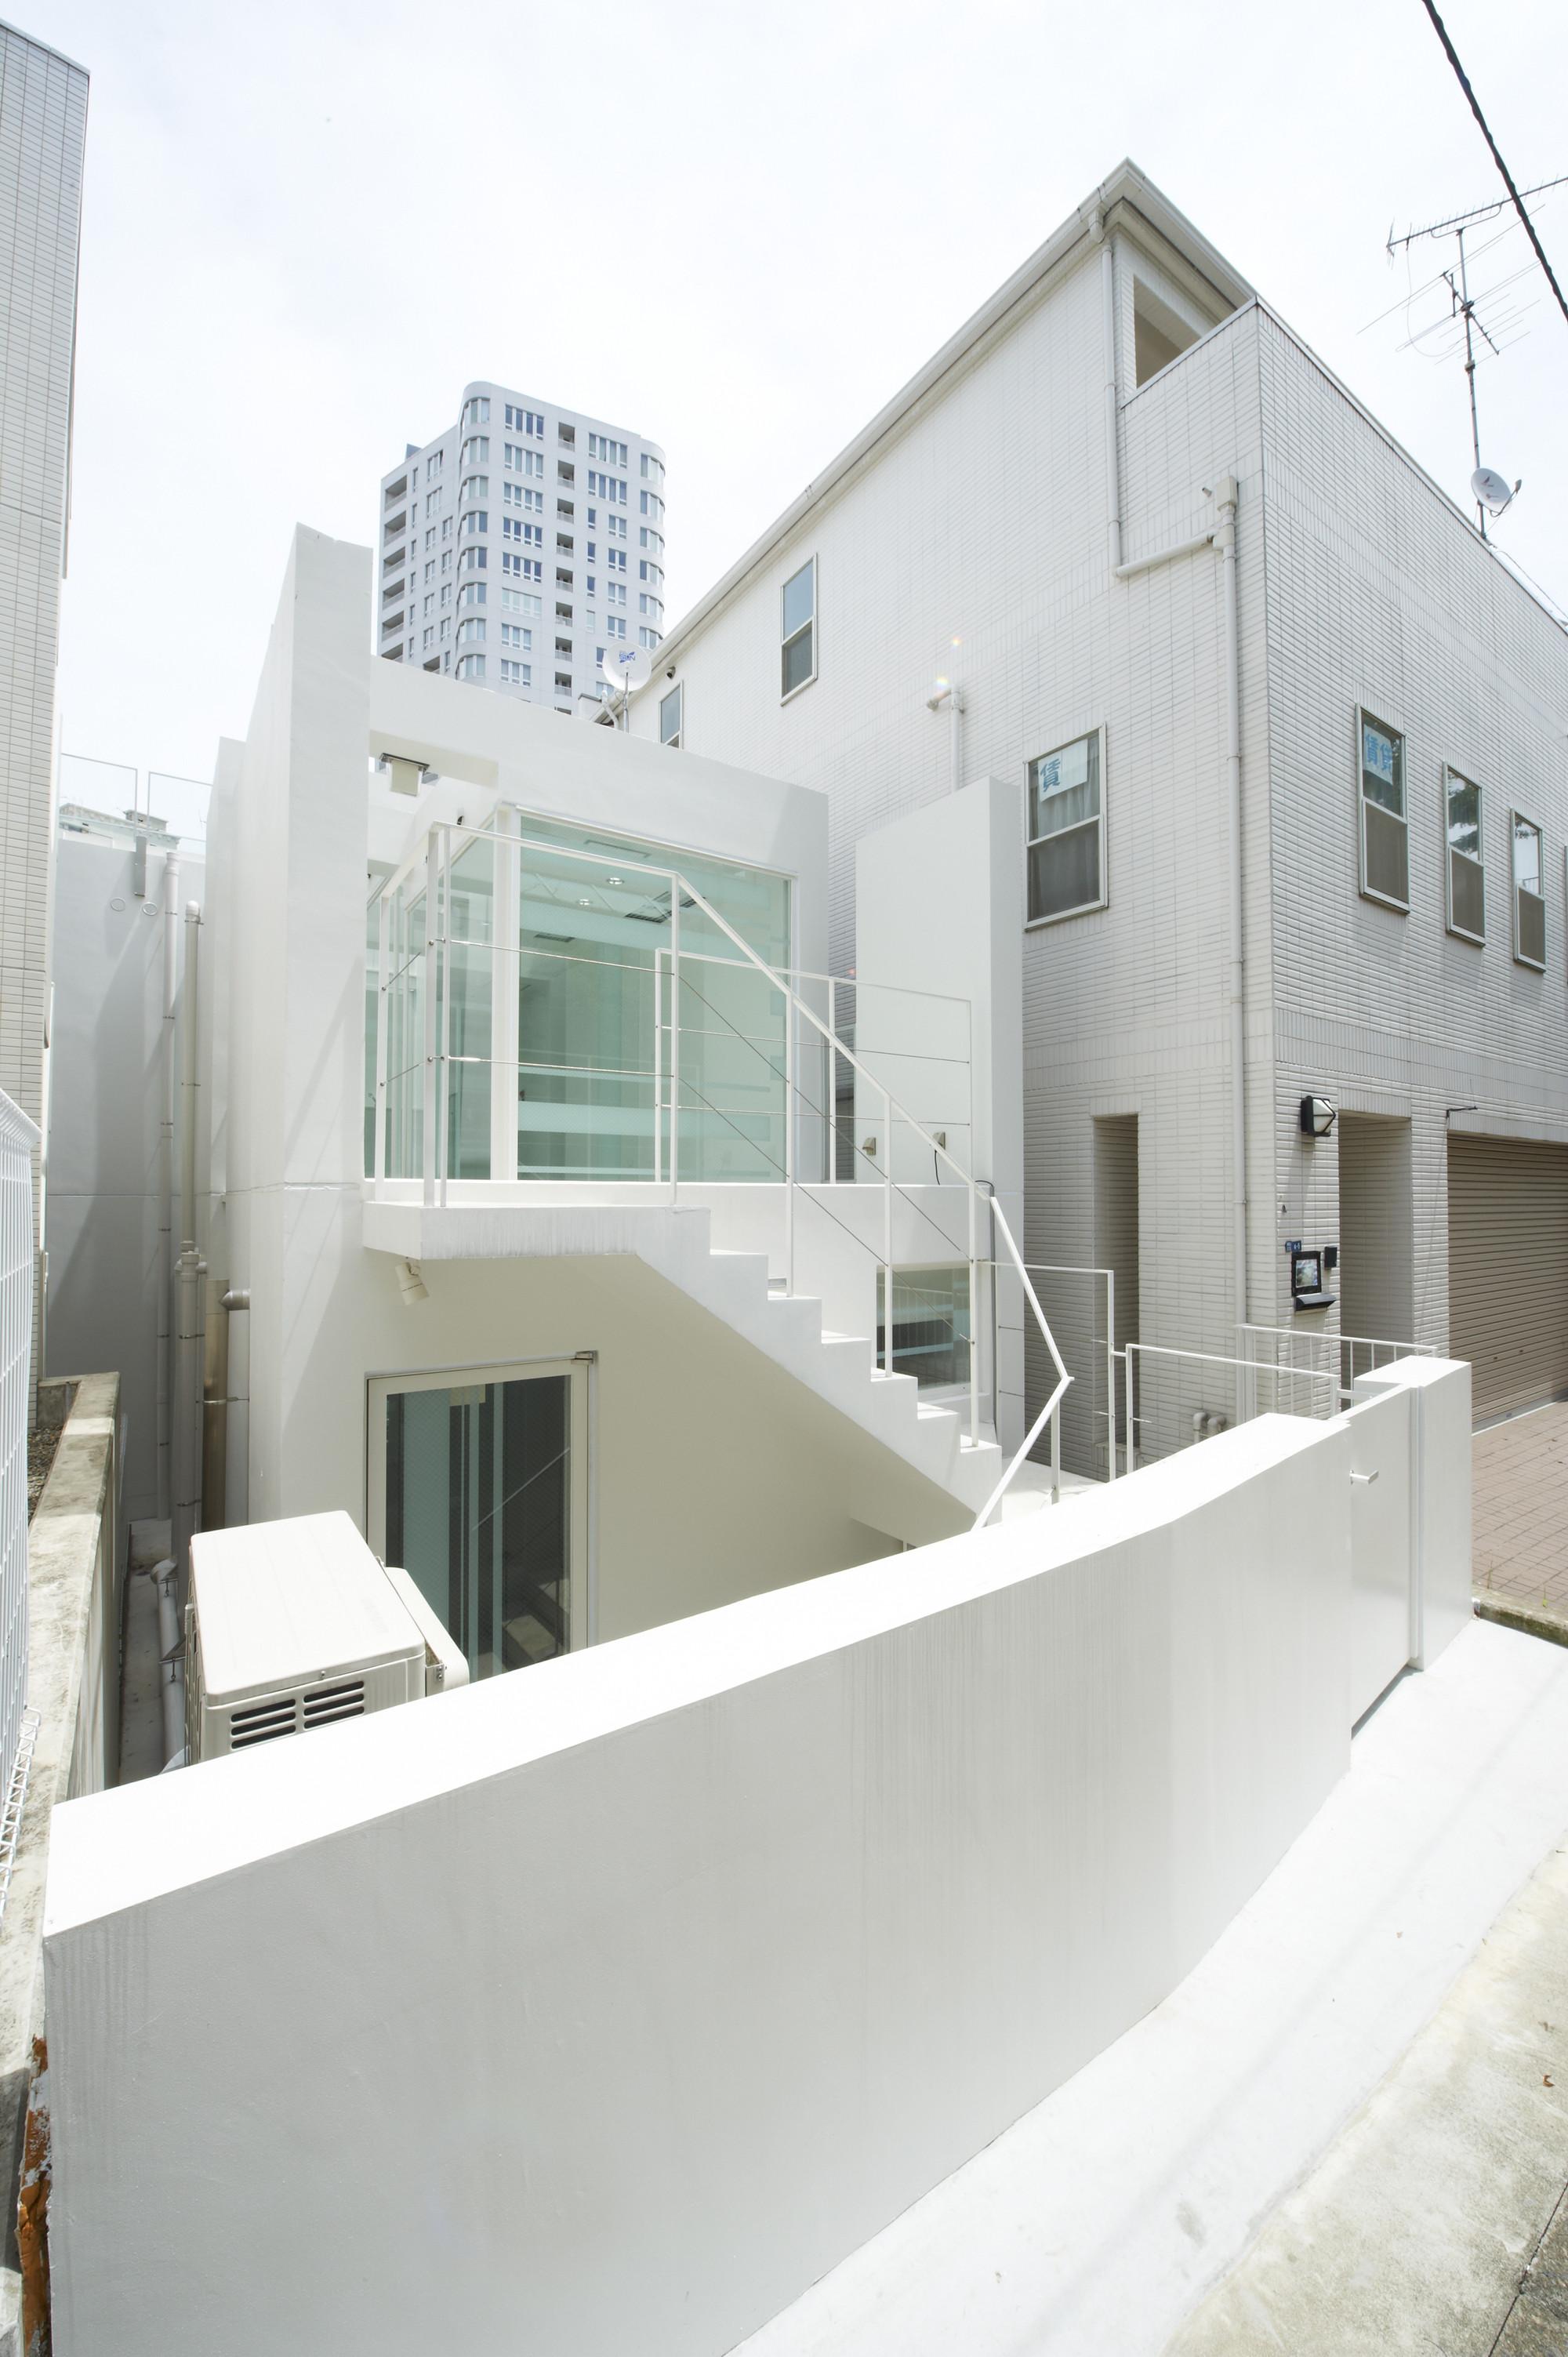 BMA Project / Ryuichi Sasaki + Sasaki Architecture